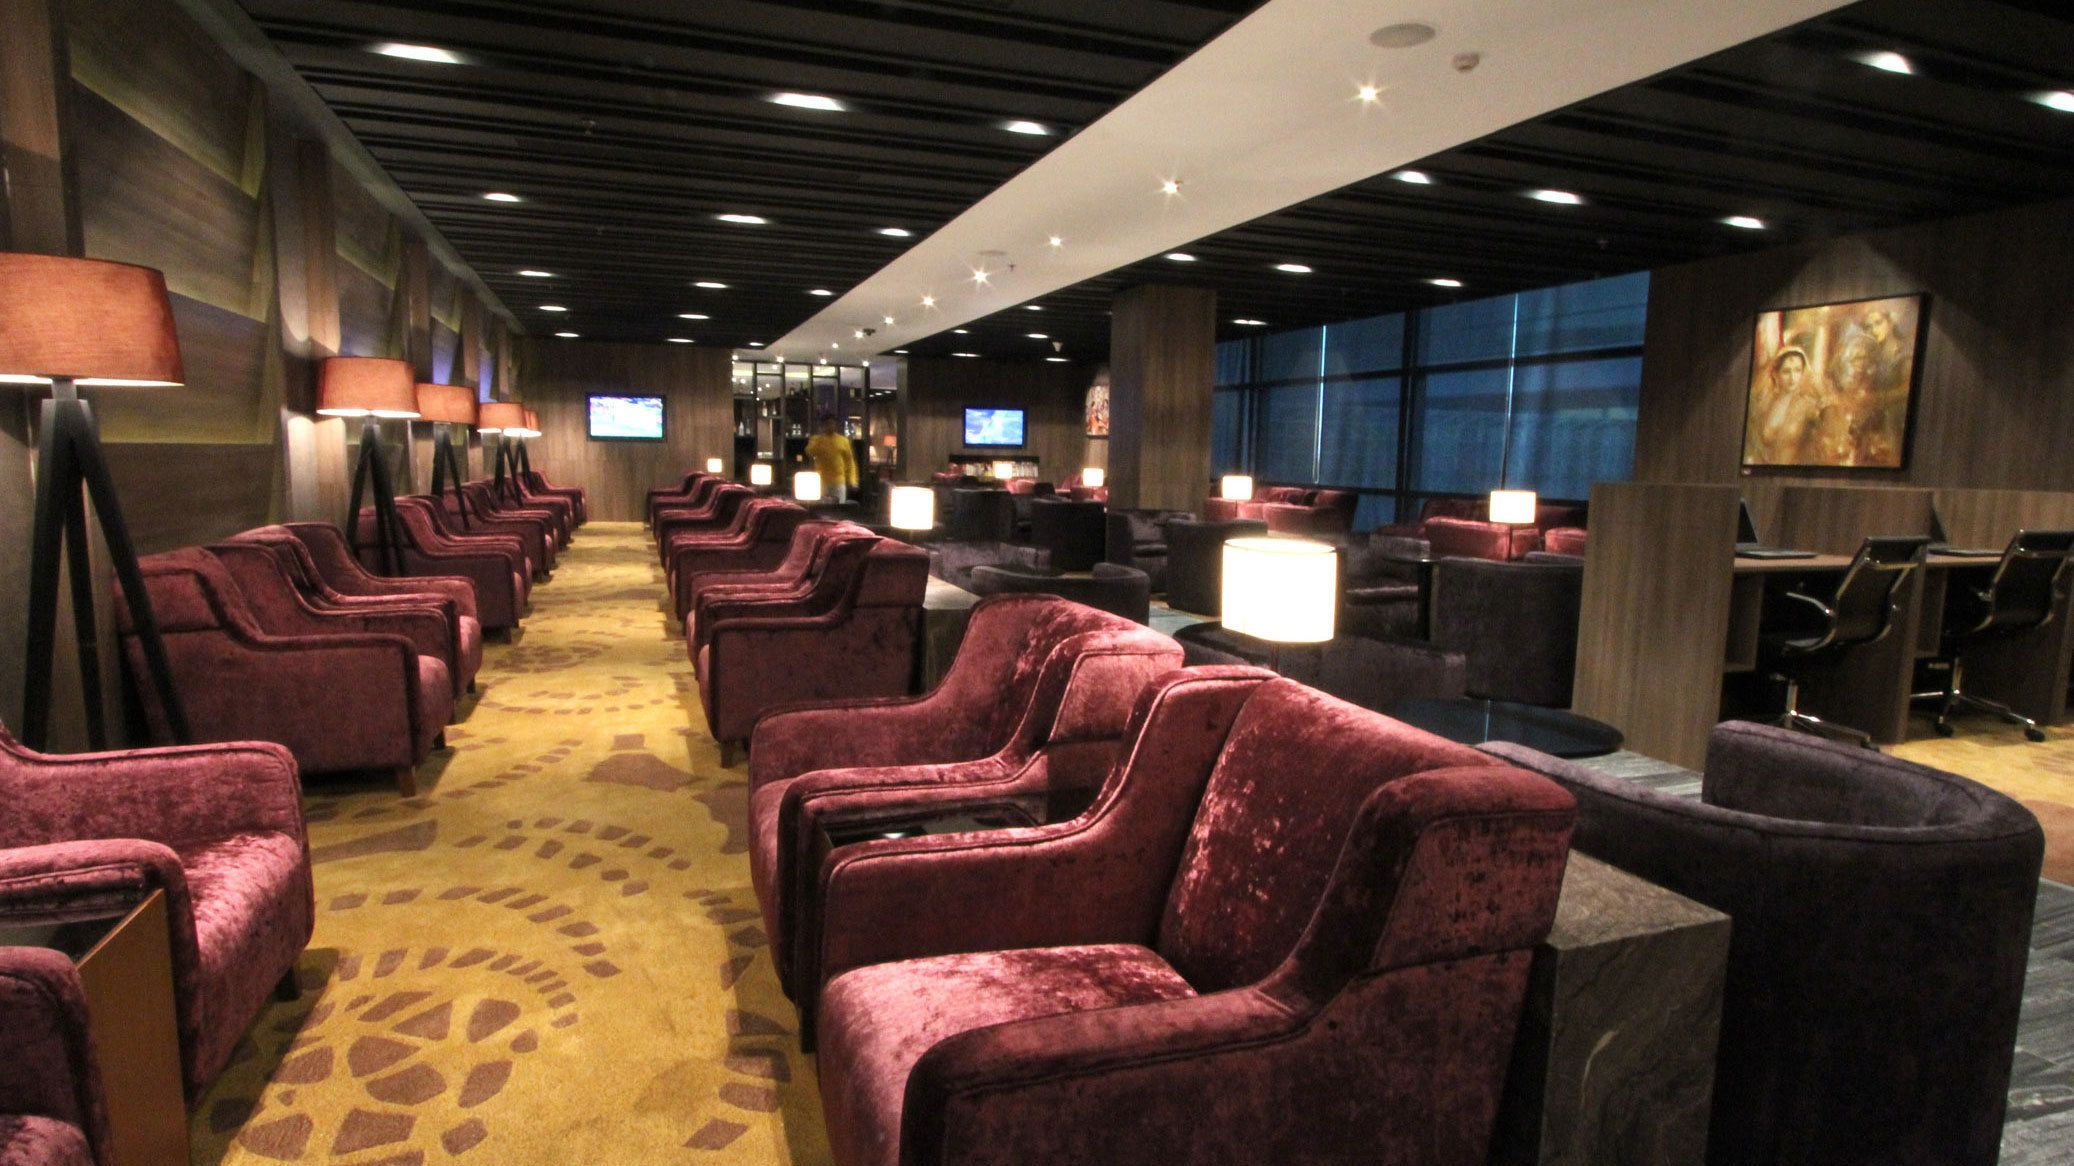 Plaza Premium Lounge at Indira Gandhi International Airport